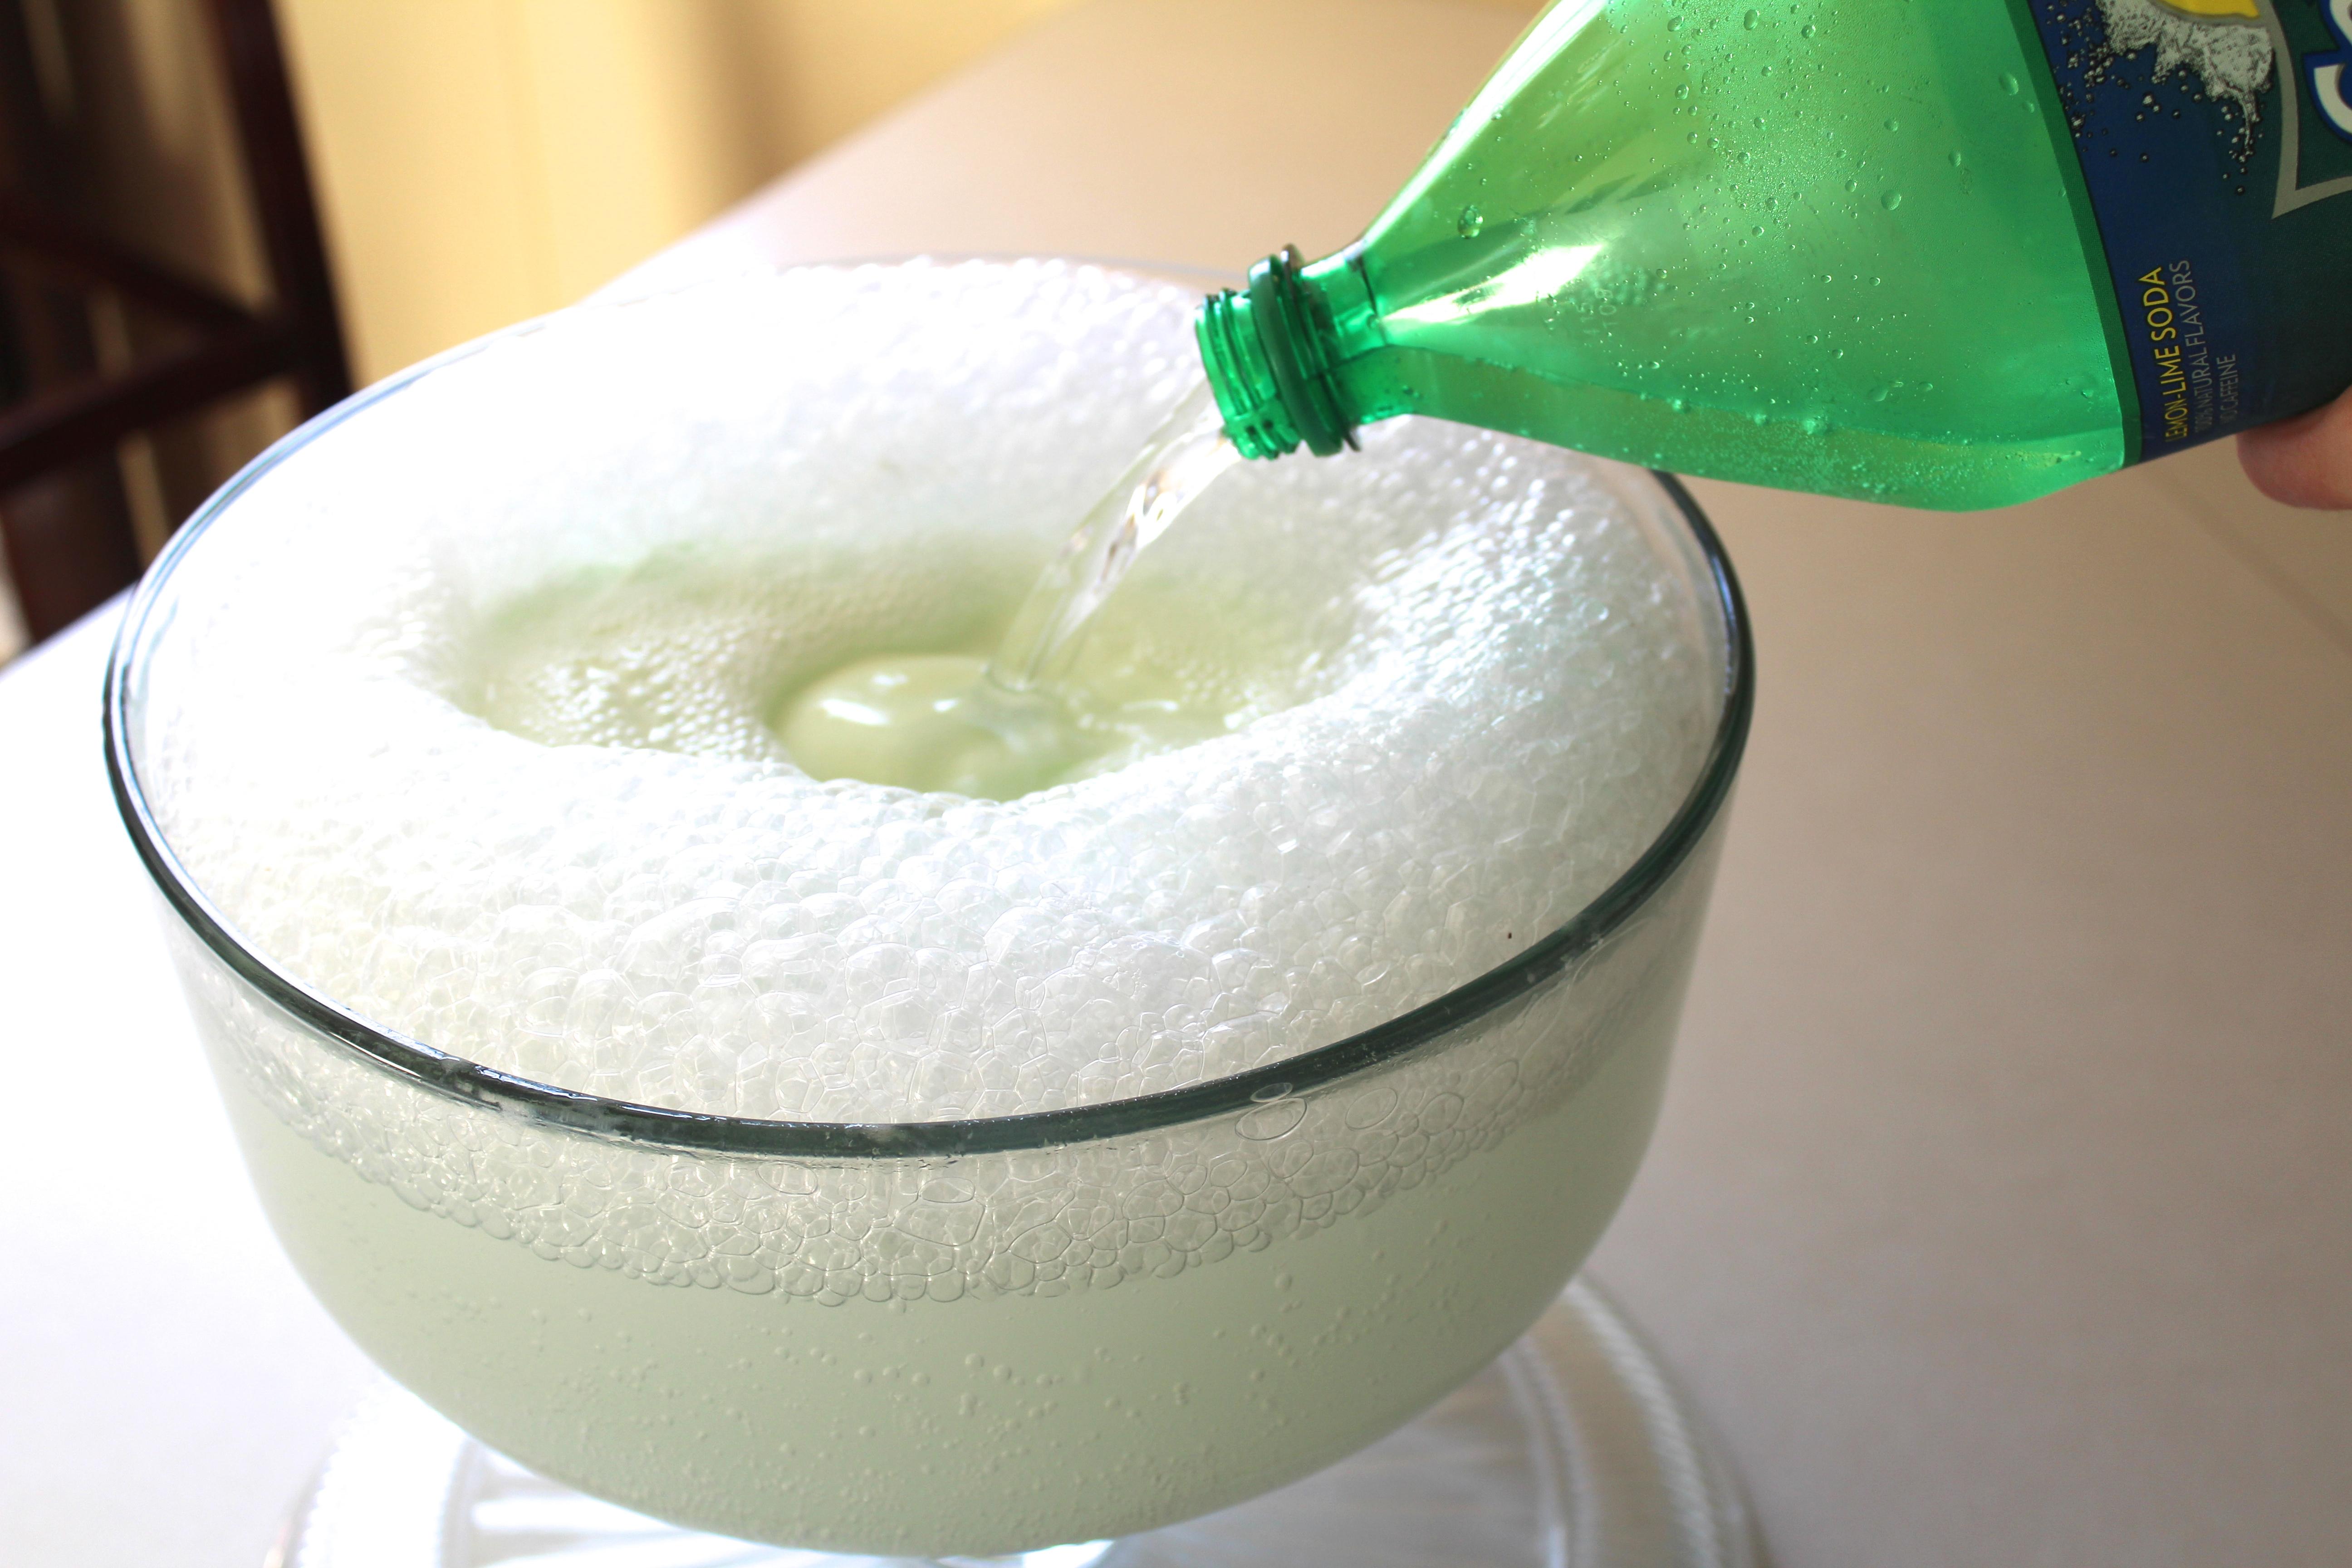 Polyjuice potion recipe tgif this grandma is fun polyjuice potion punch nonalcoholic forumfinder Choice Image